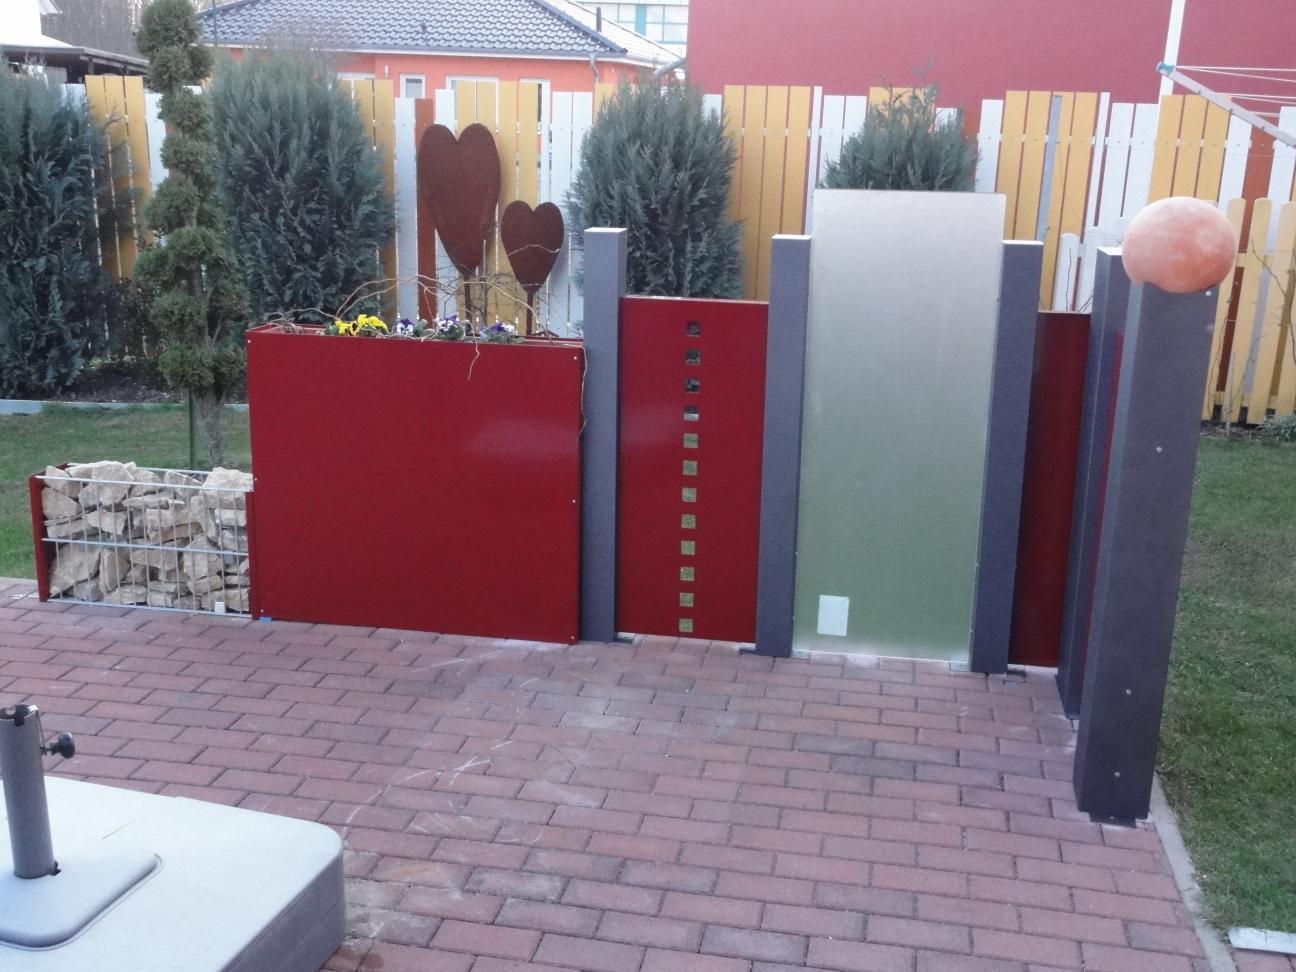 soloblech modular dekorstanzung 155 x 62 cm alles f r haus und garten aus metall. Black Bedroom Furniture Sets. Home Design Ideas